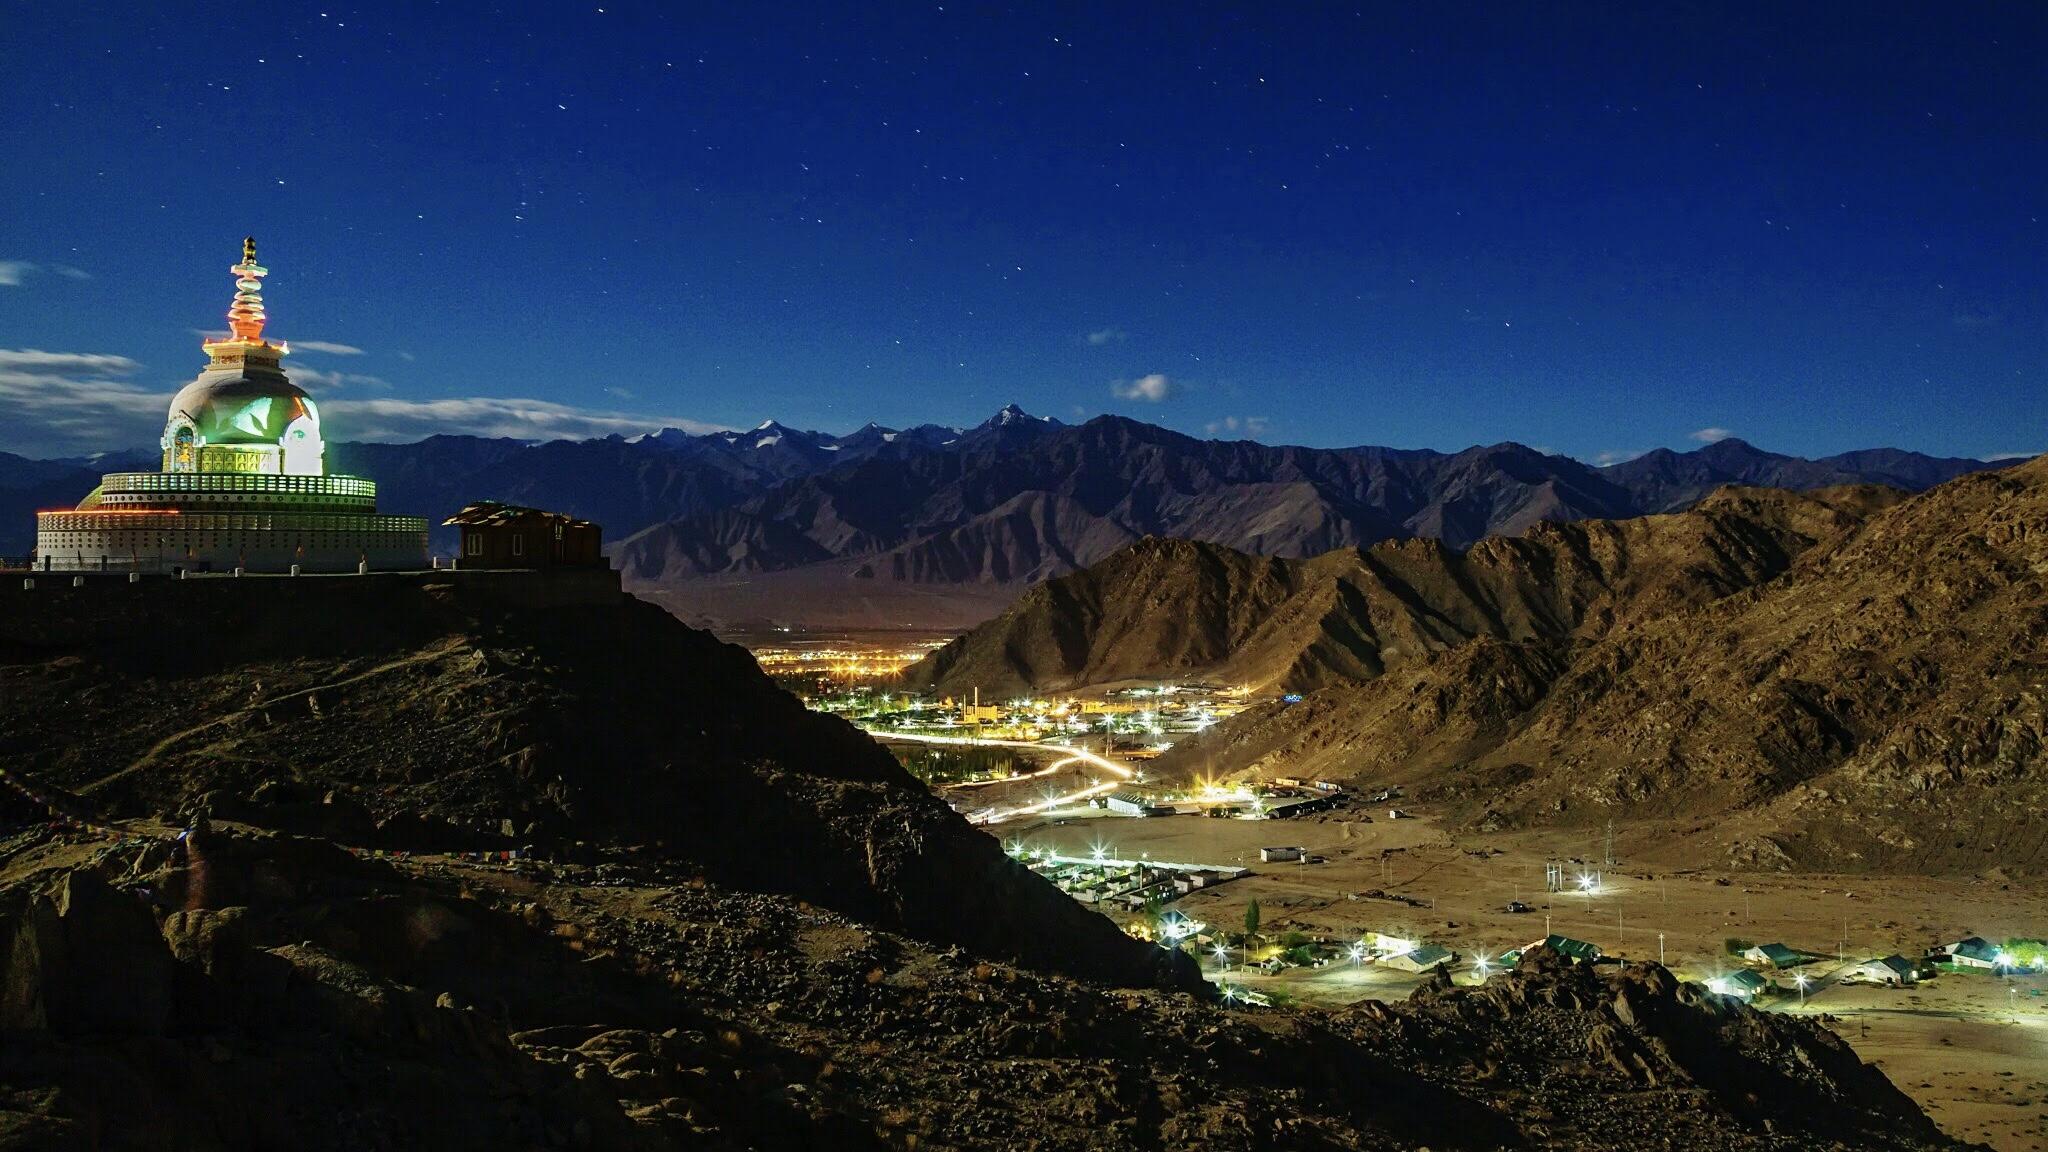 Leh valley at night